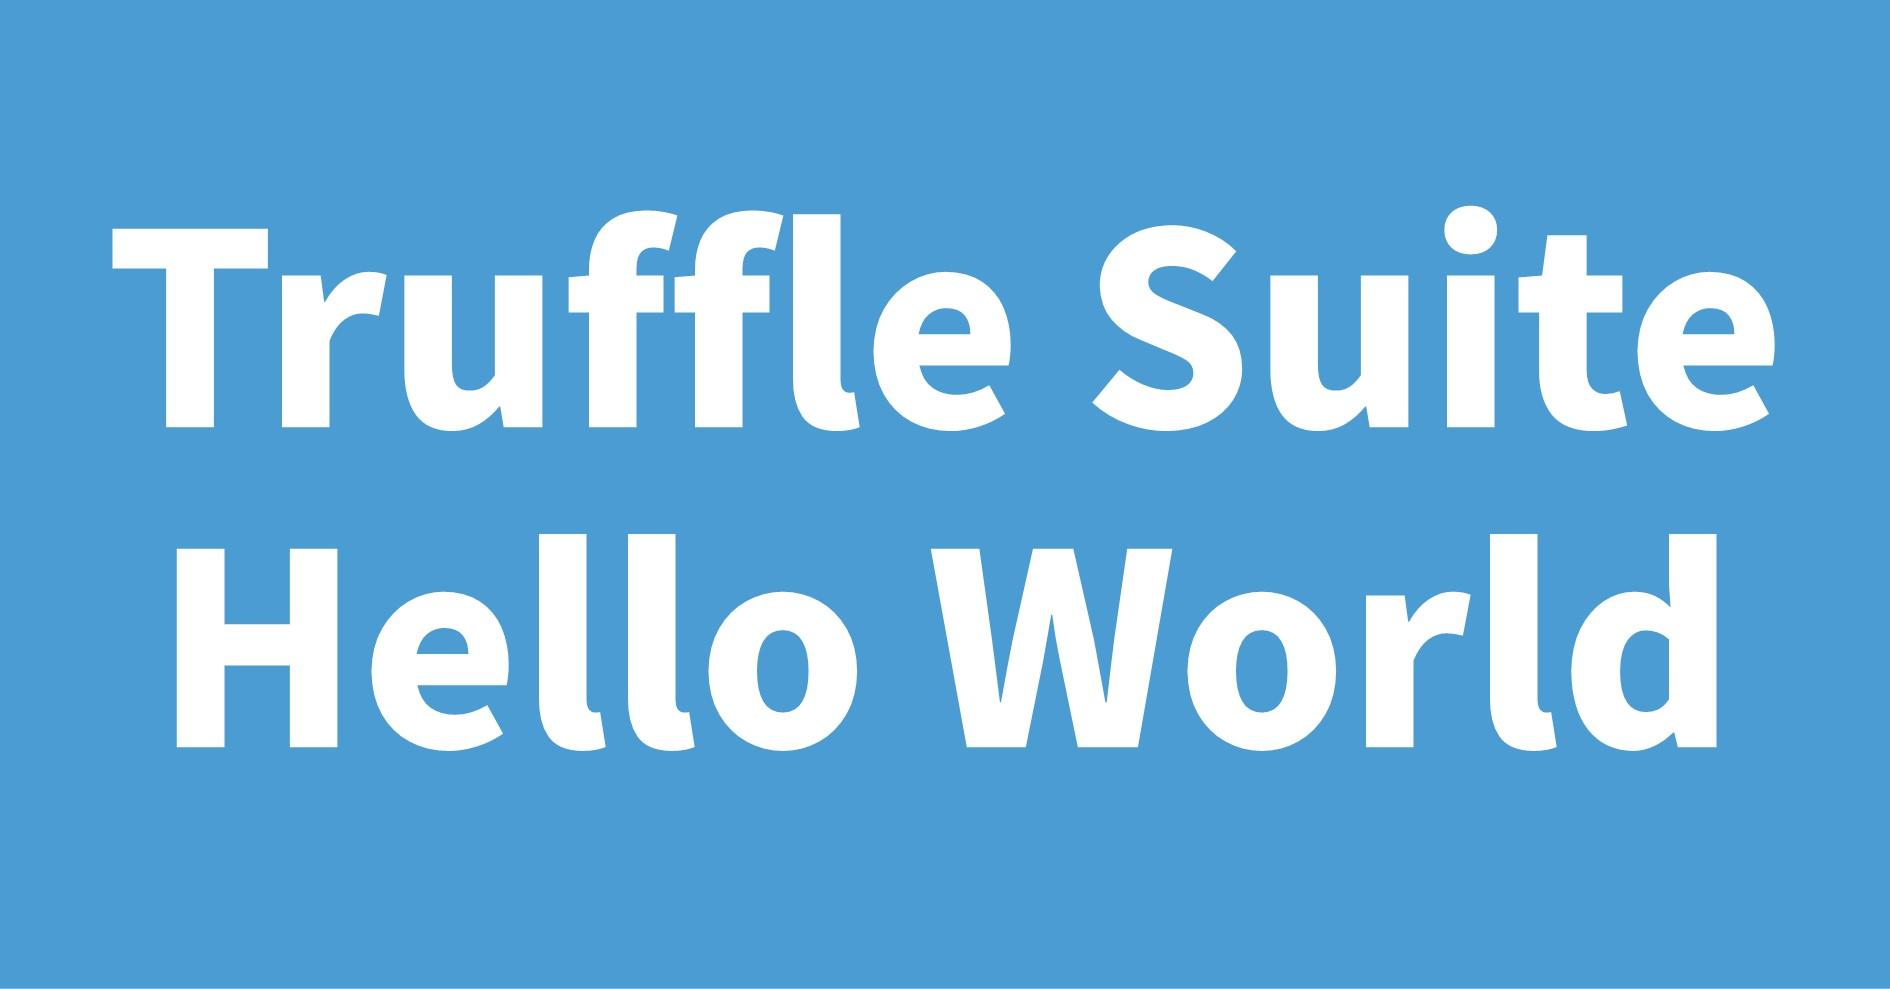 Truffle Suite Hello World